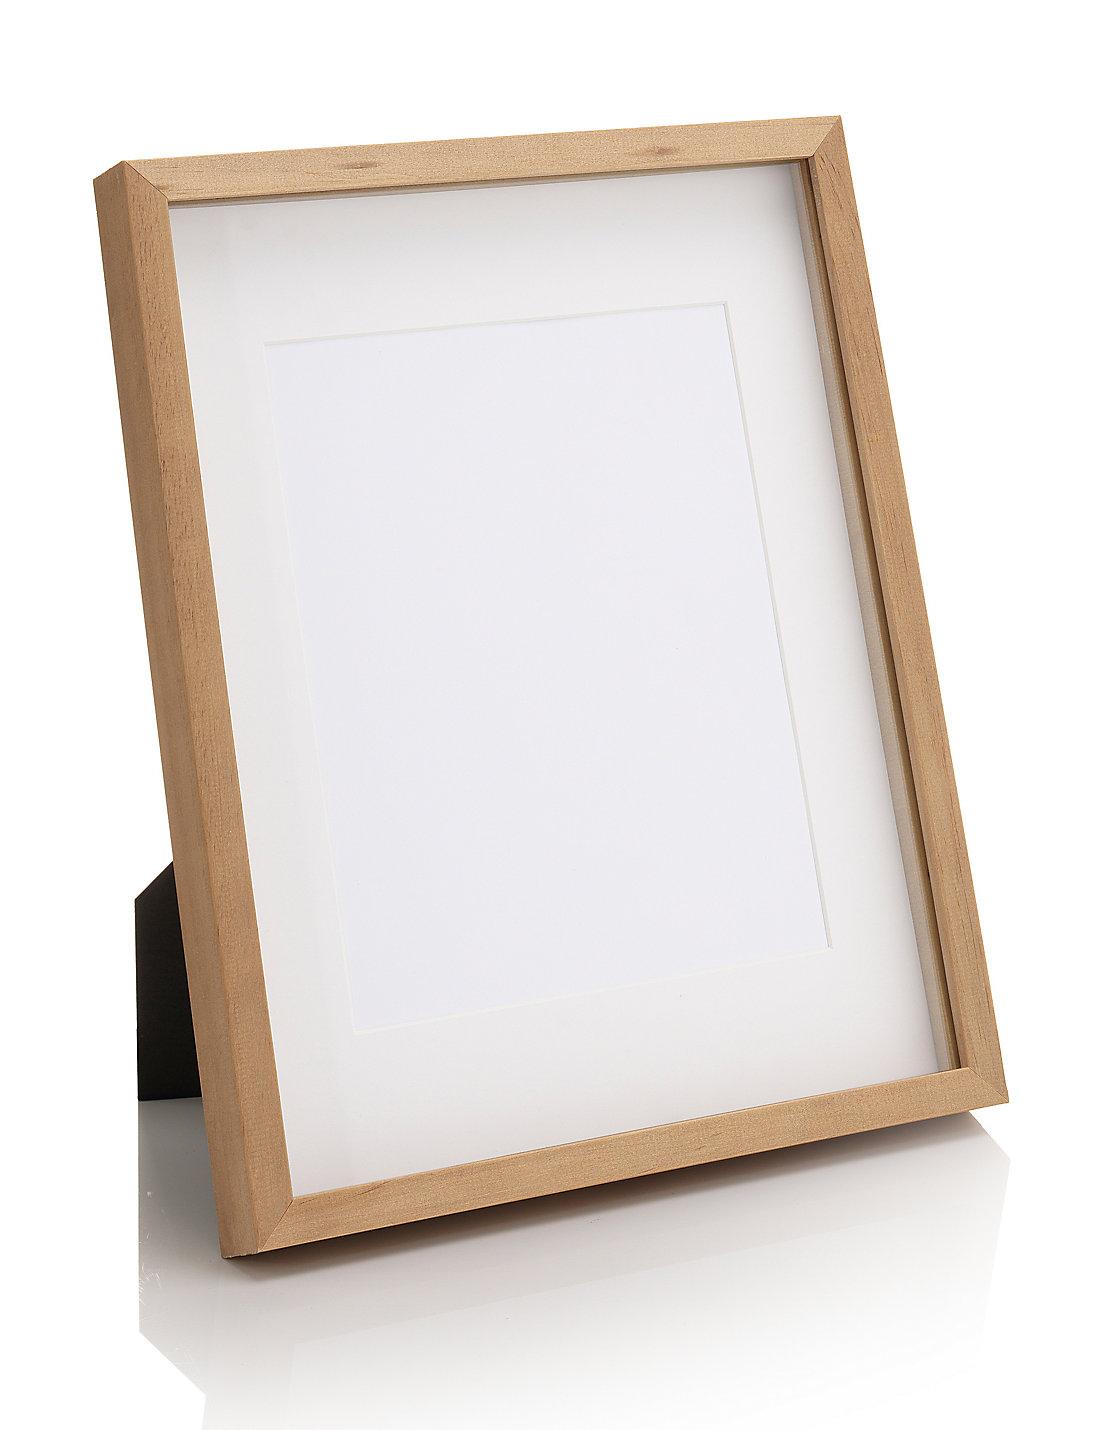 Essential pine photo frame 20 x 25cm 8 x 10inch ms essential pine photo frame 20 x 25cm 8 x 10inch jeuxipadfo Gallery